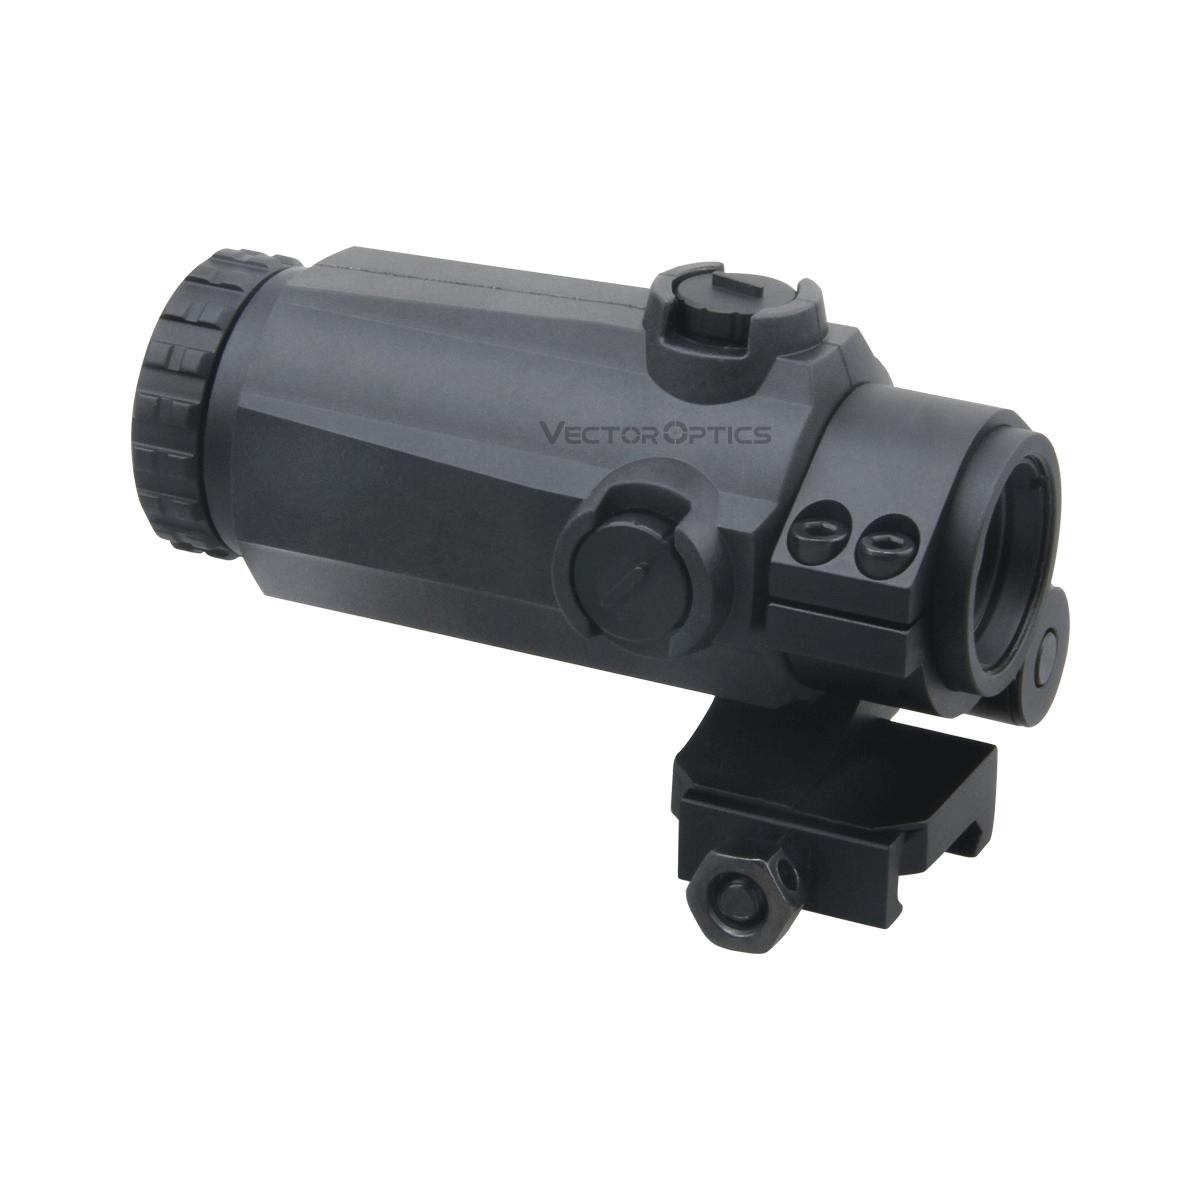 Maverick-III 3x22 Magnifier MIL